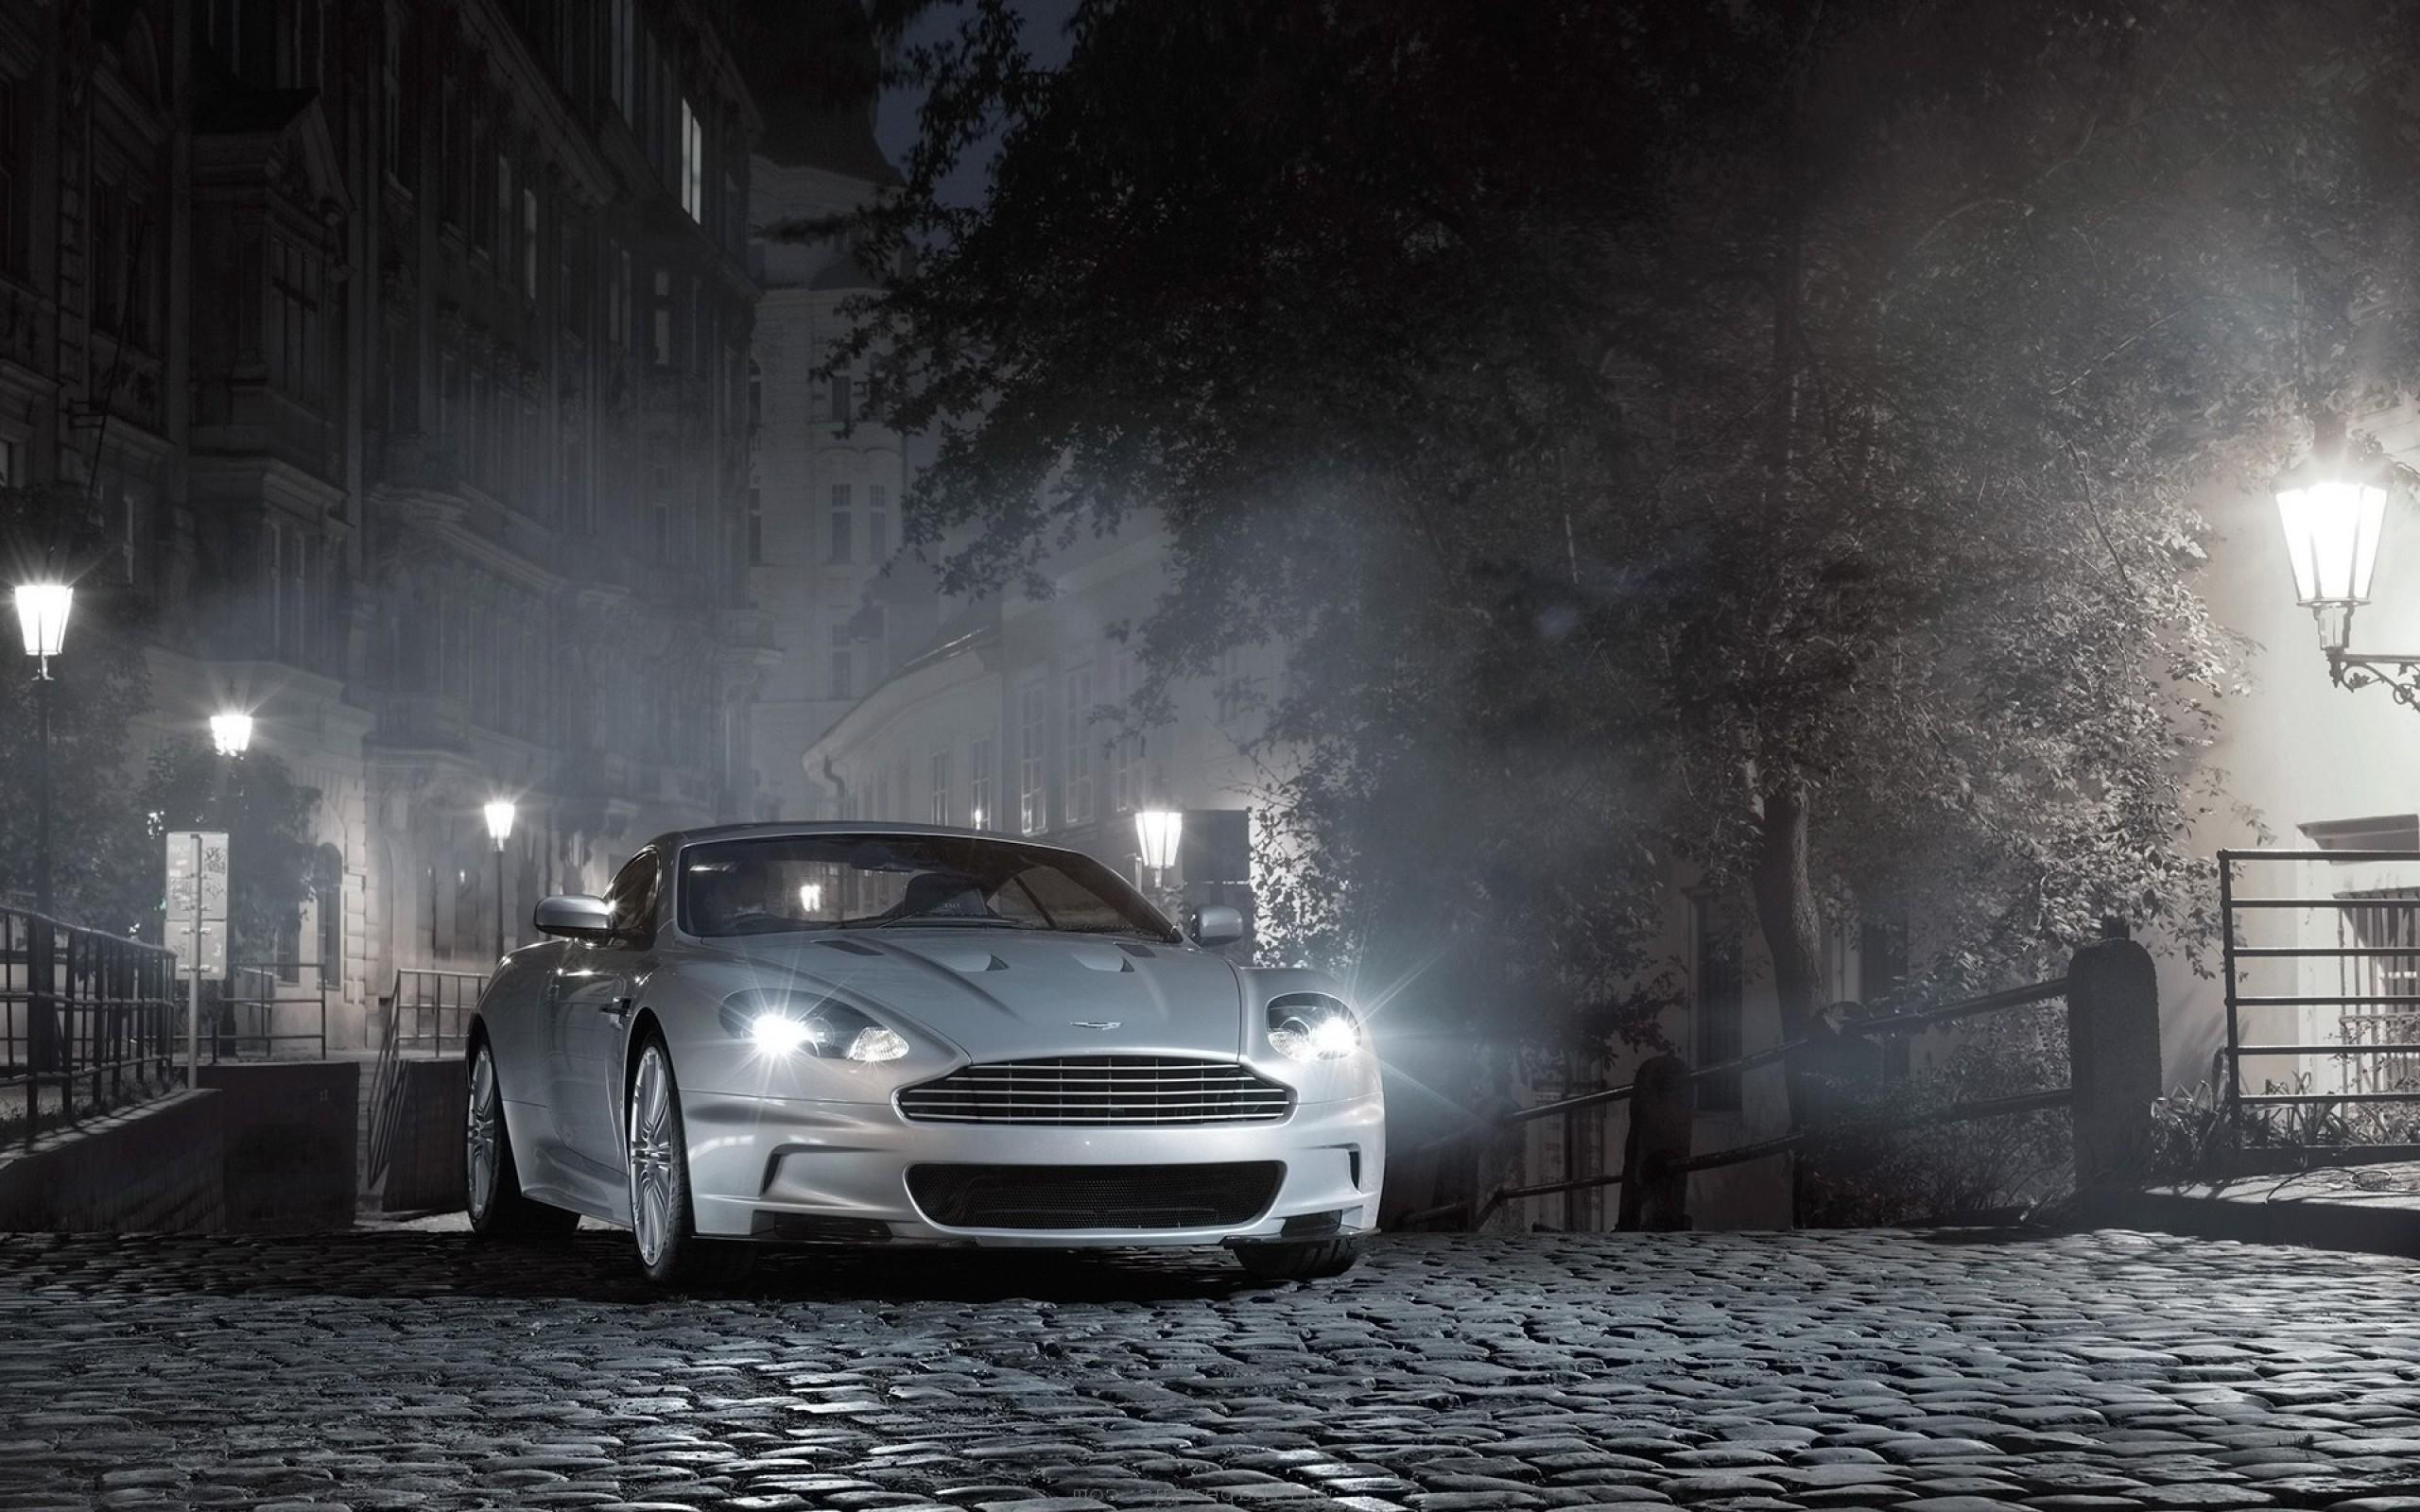 Aston Martin Dbs Wallpaper (73+ Images